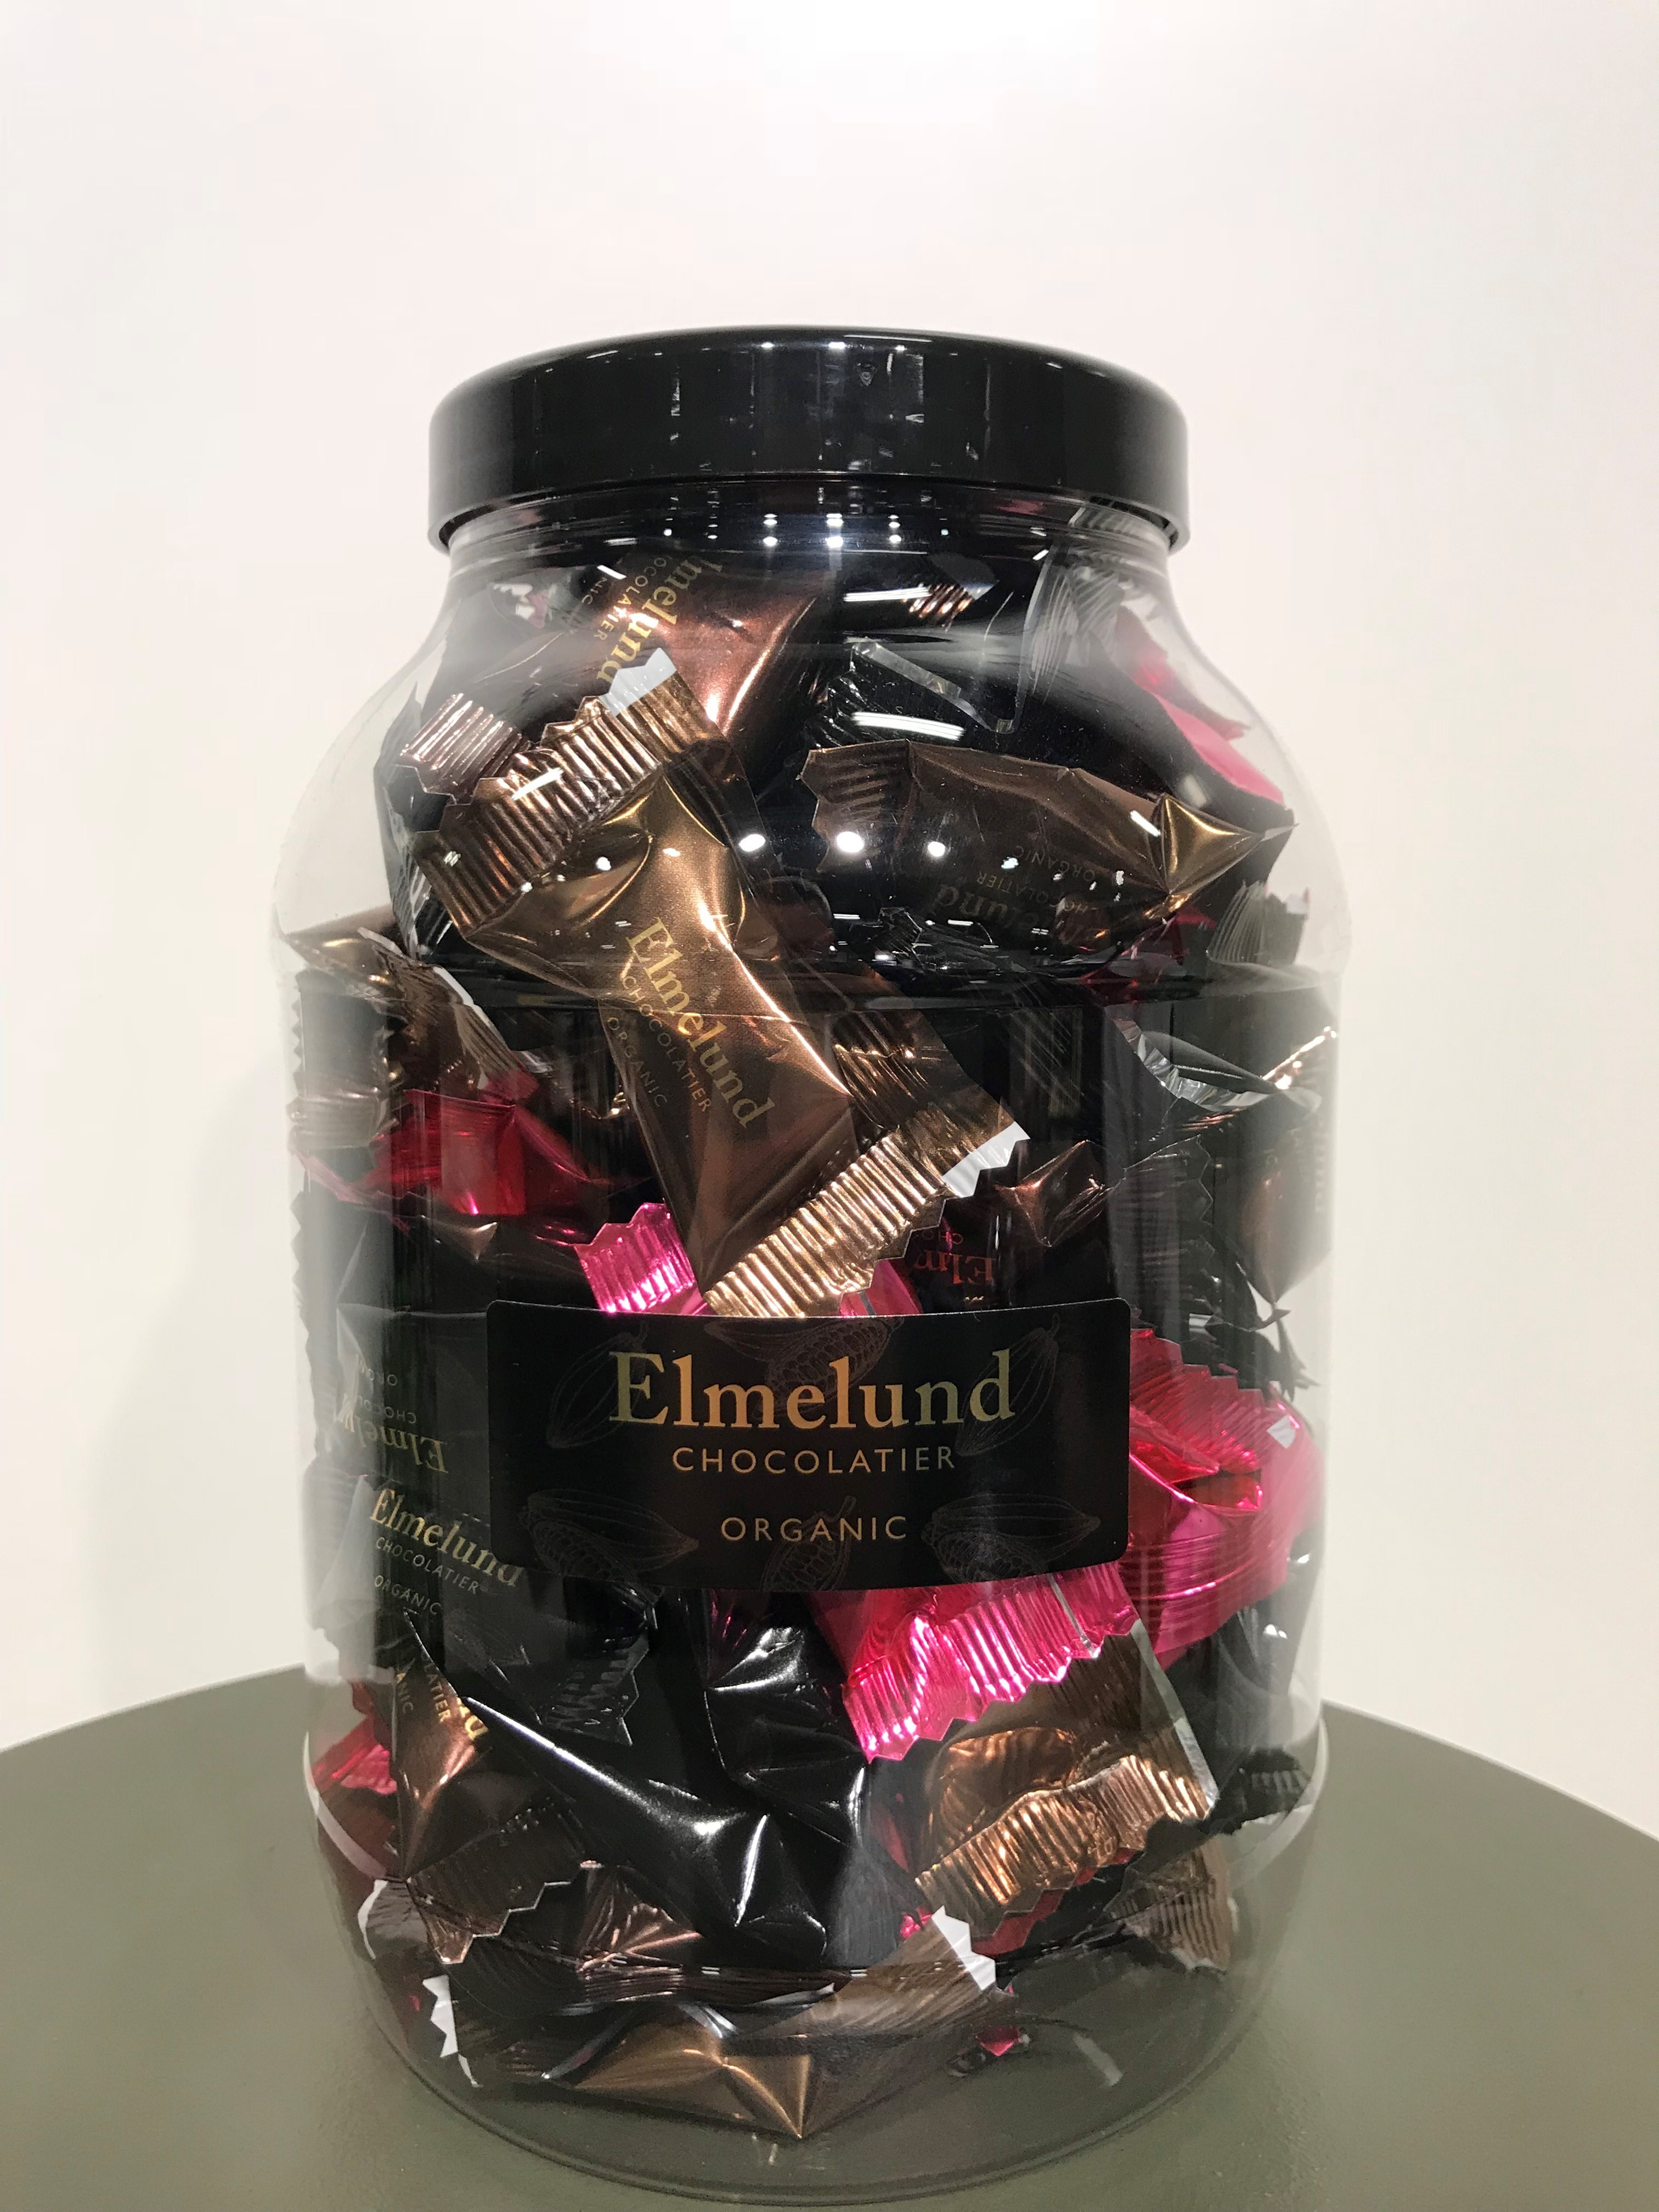 Økologisk Dragee chokolade, 1 stk., 5 g. Fra Elmelund